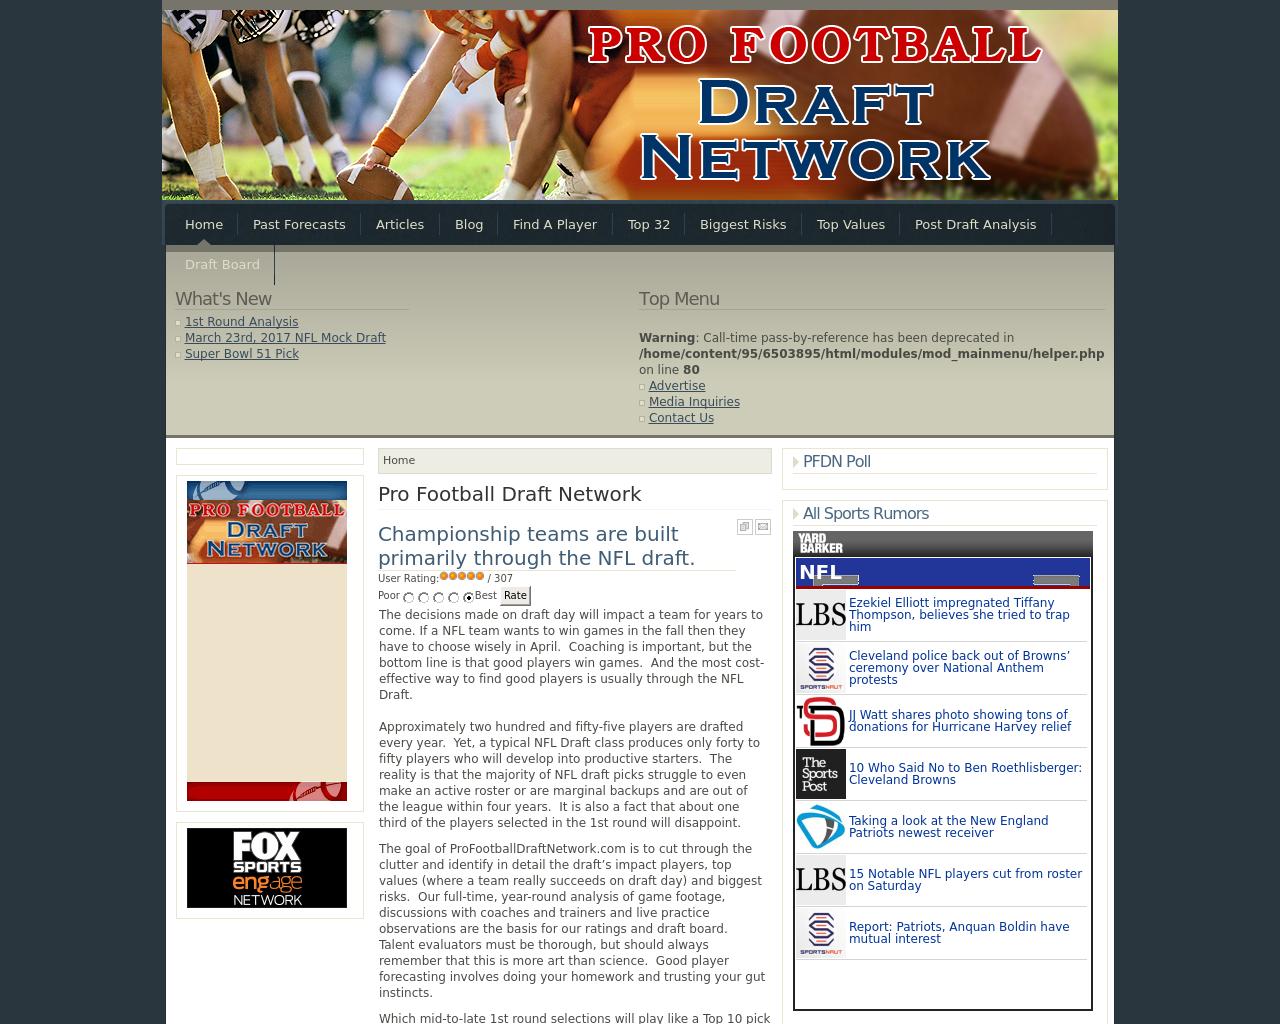 Pro-Football-Draft-Network-Advertising-Reviews-Pricing